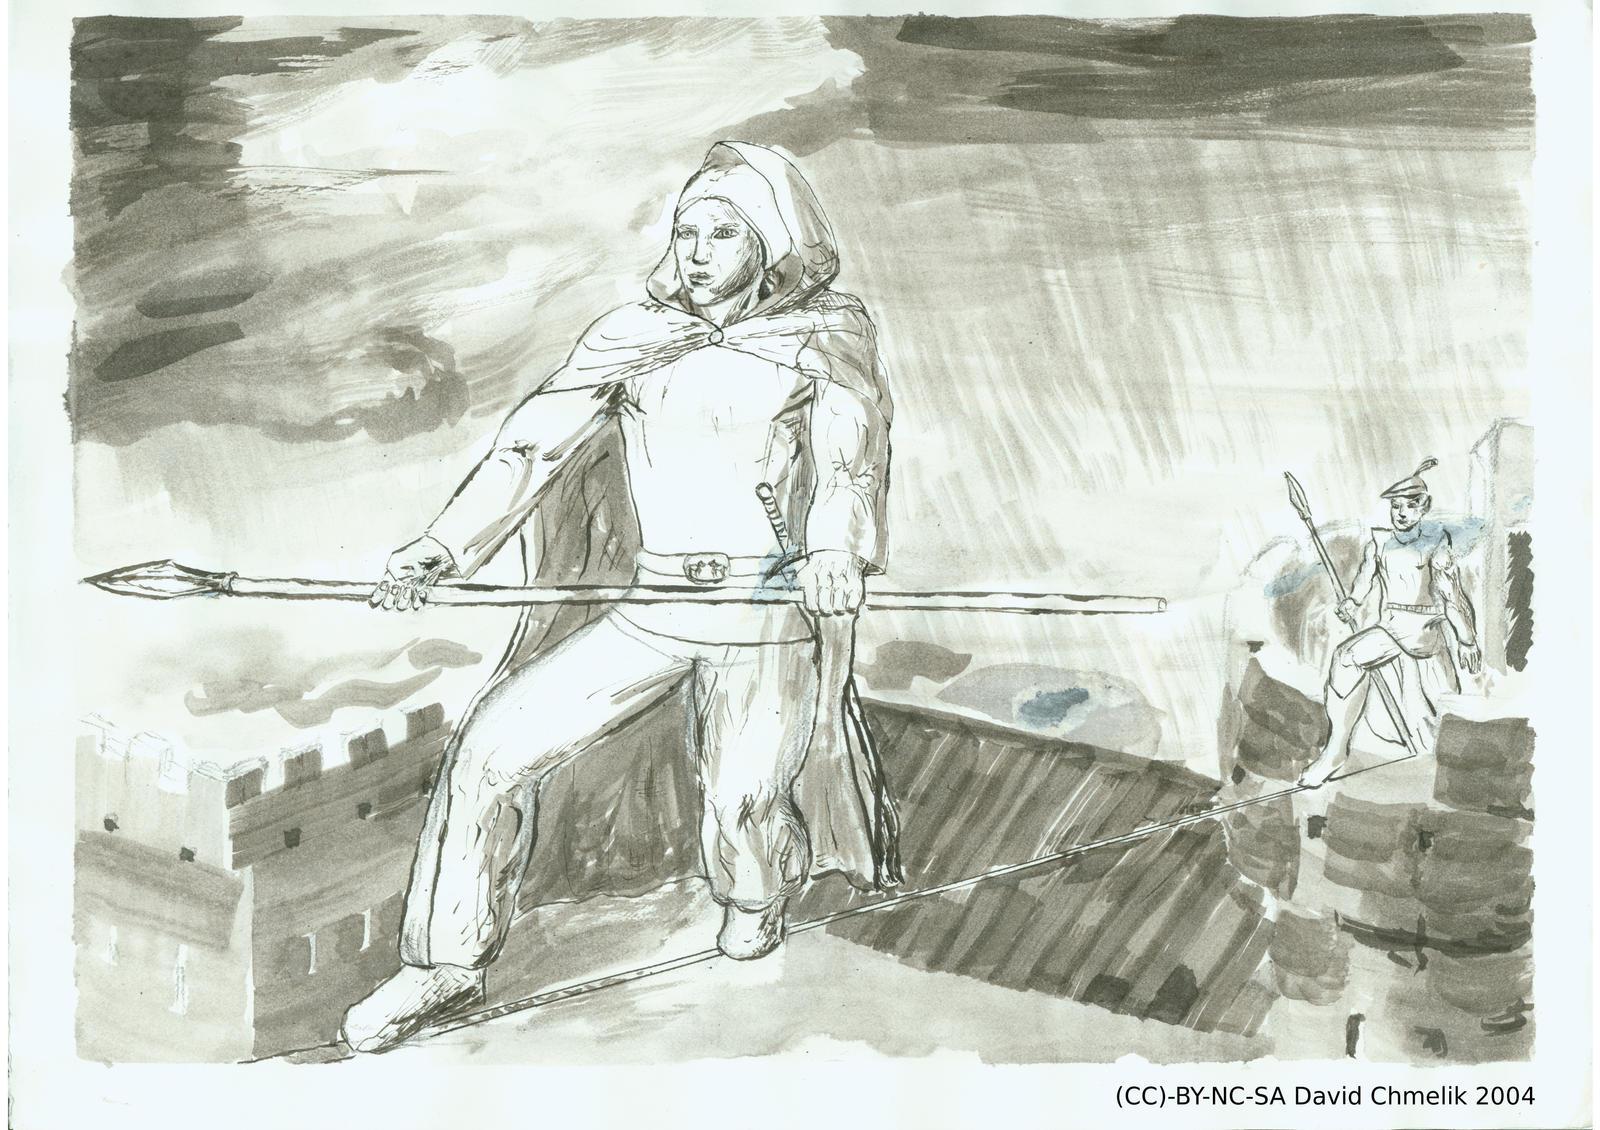 Tyran Alaric of Sherwood and Darwin on Tightrope by dchmelik